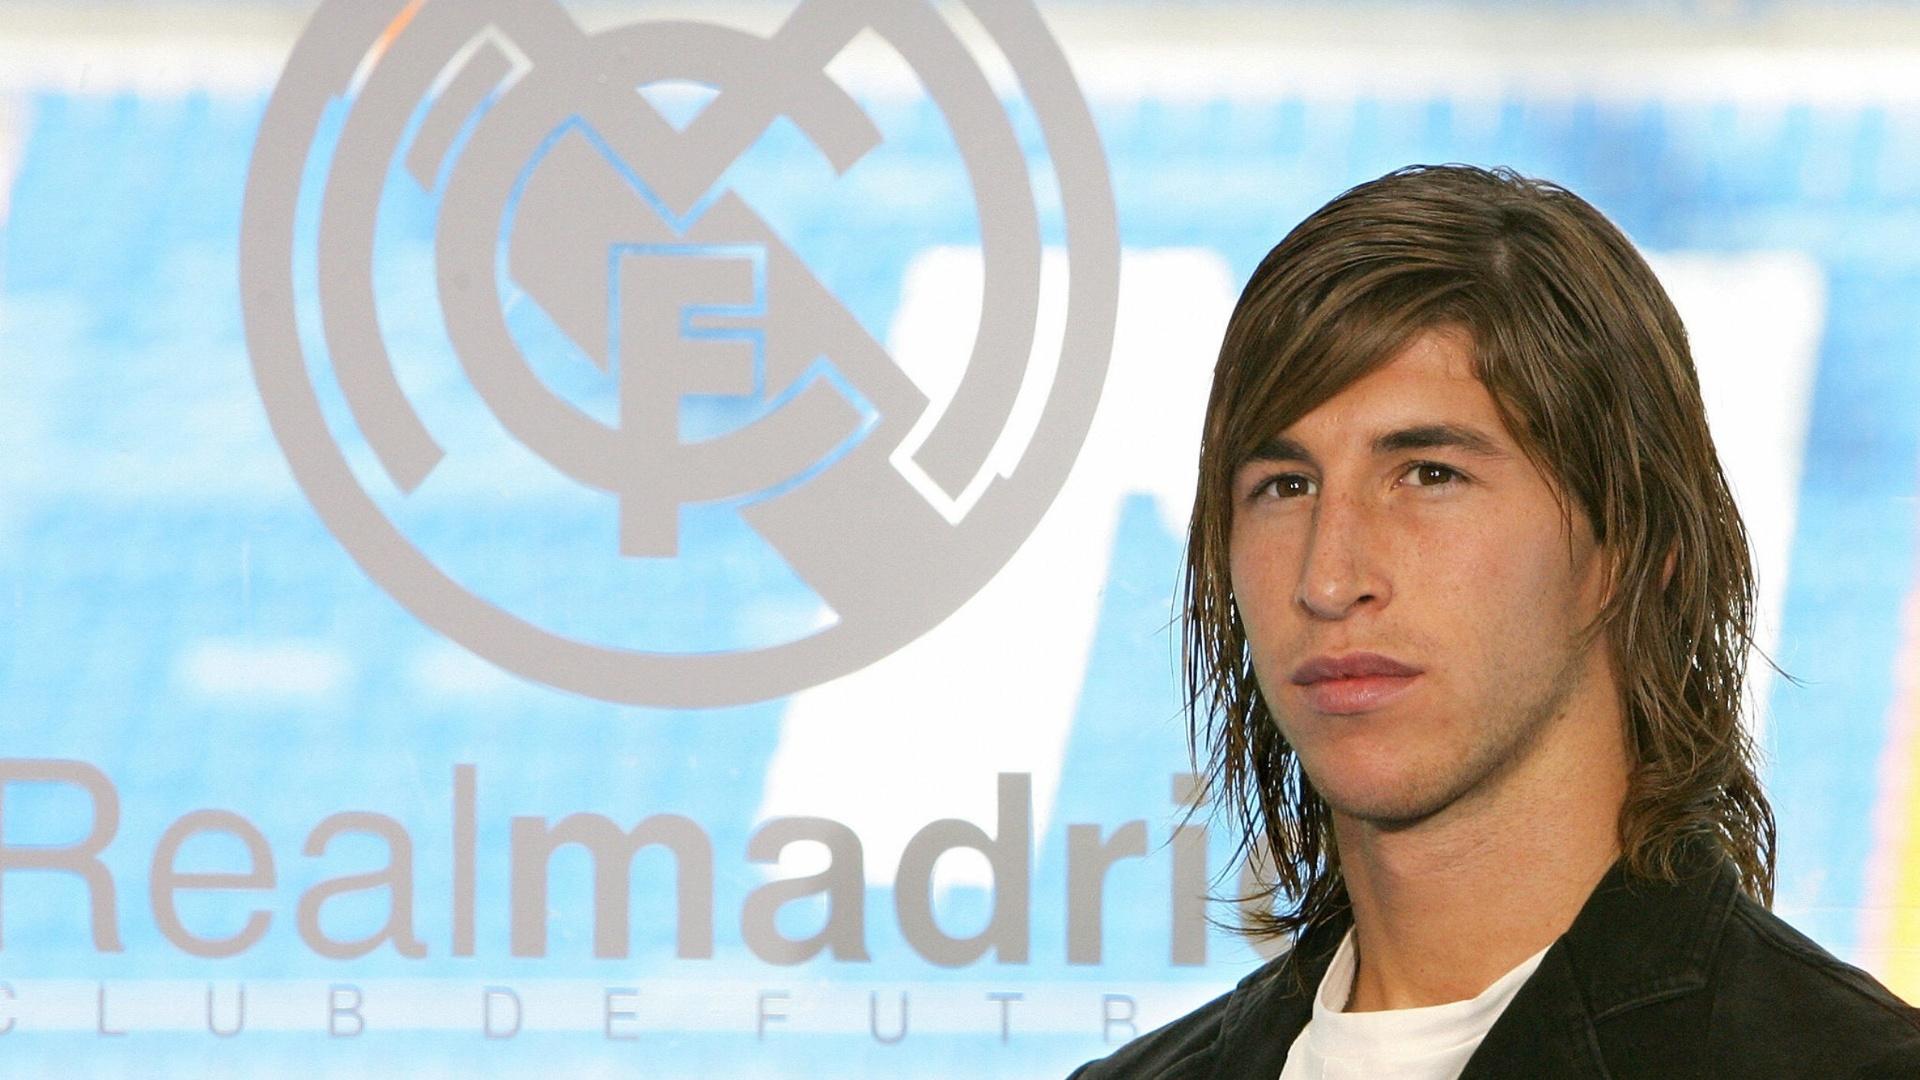 VIDEO: Sergio Ramos marks 15 years at Real Madrid